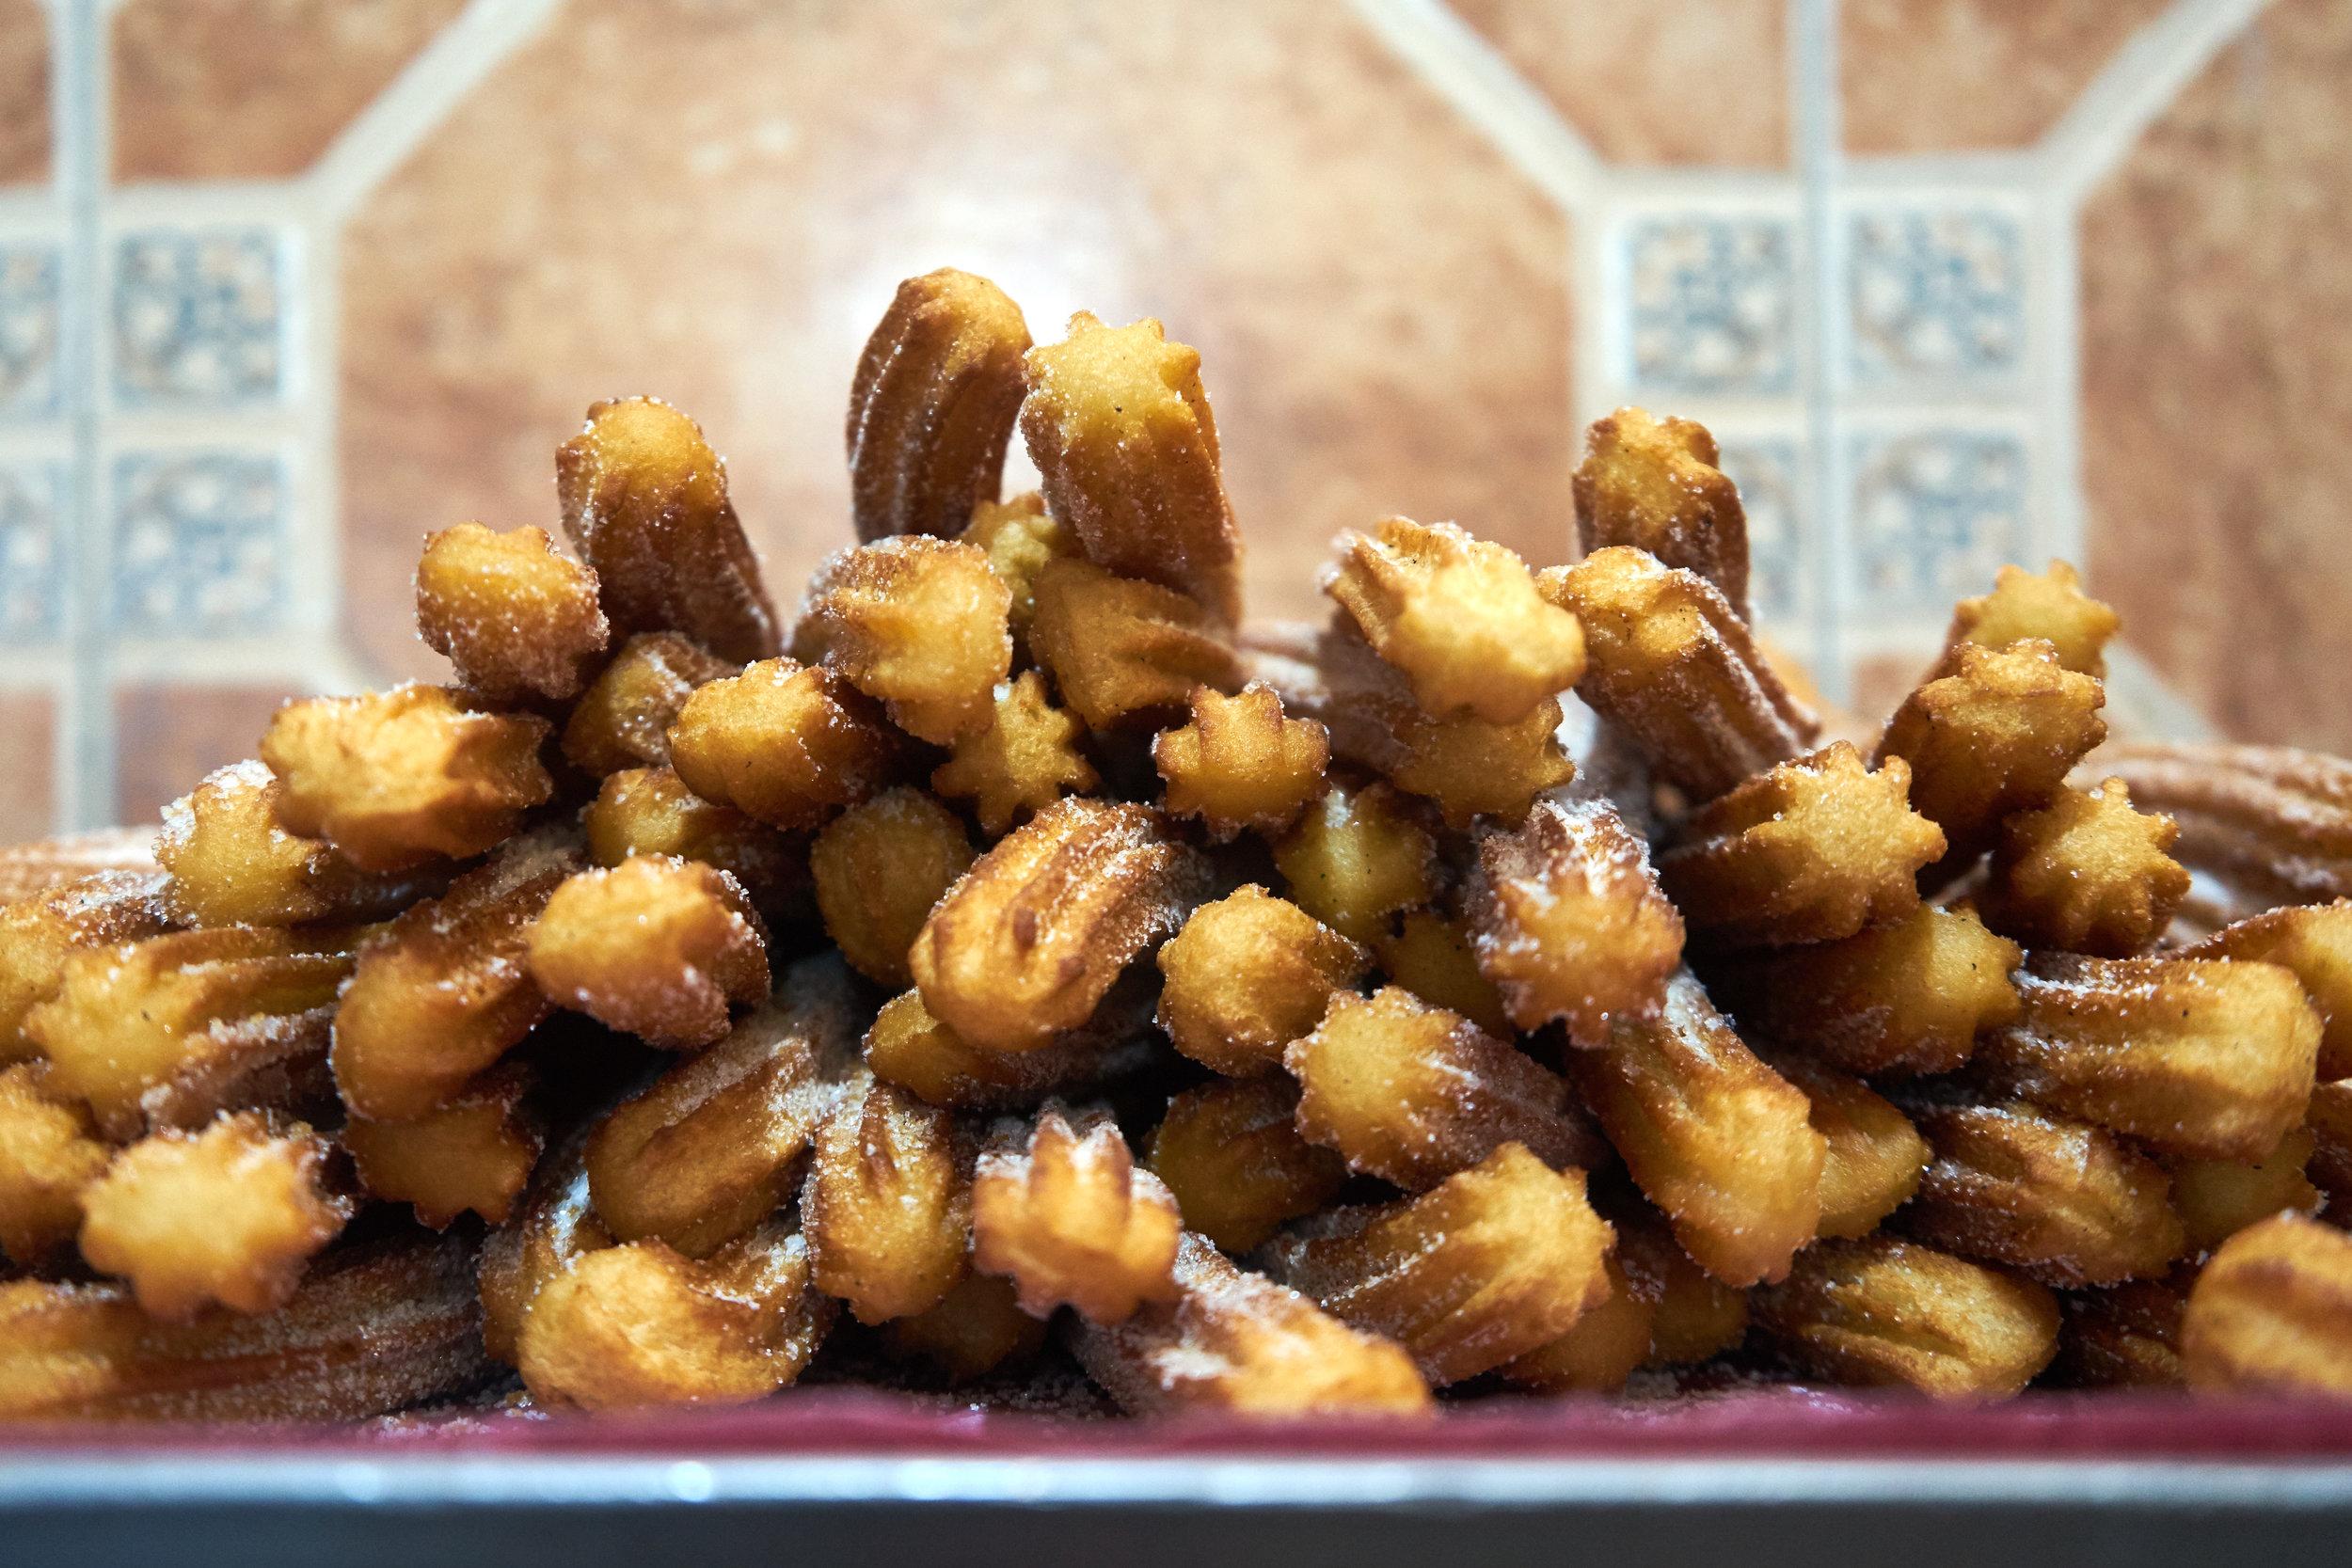 Eternally stacked churros at Fonda Margarita.